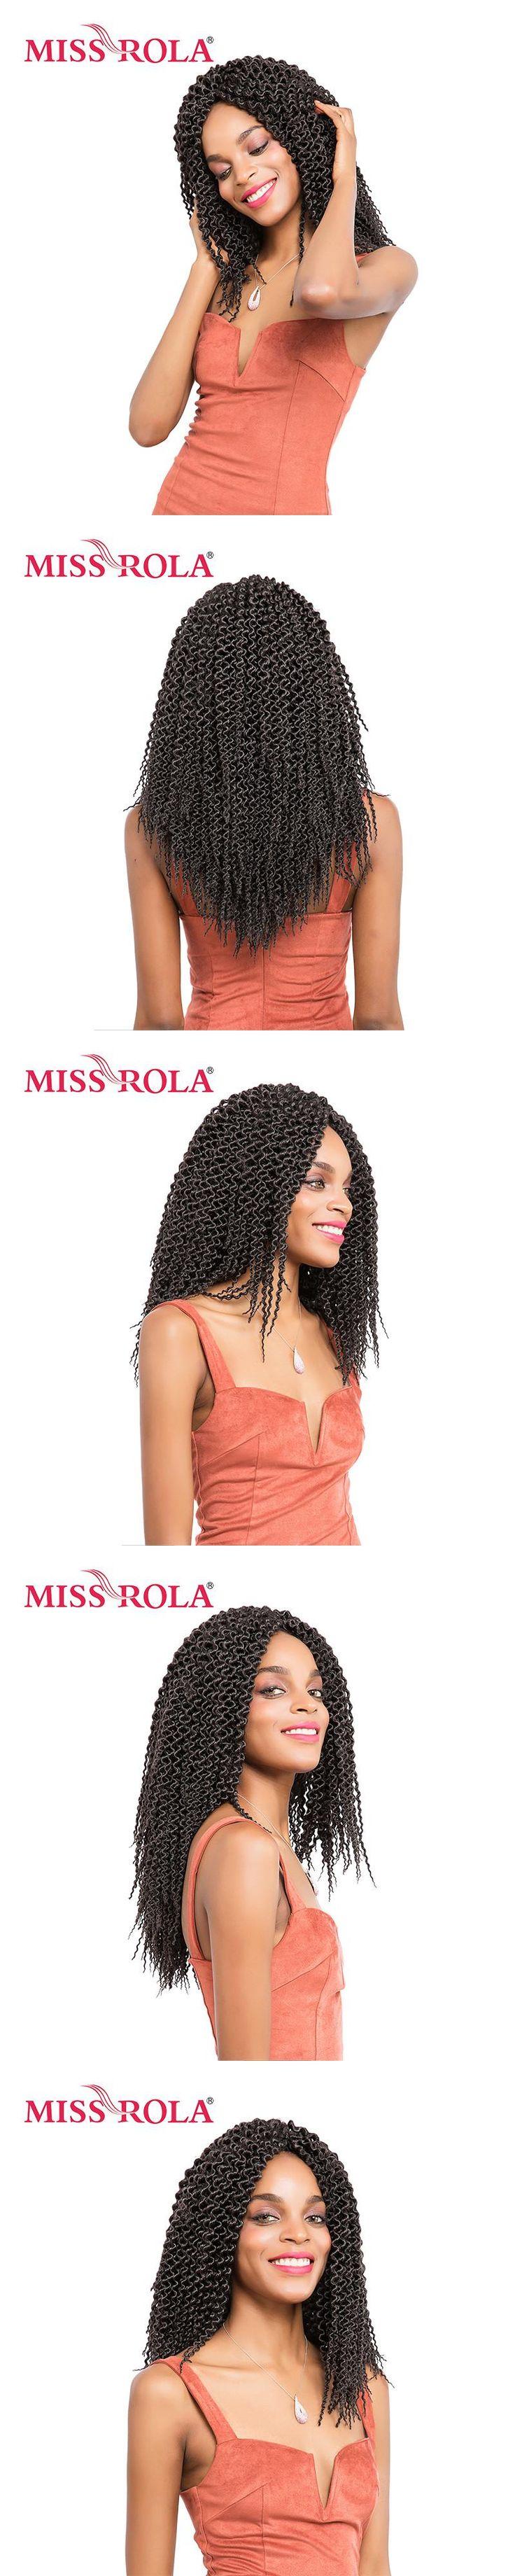 Miss Rola Pure Color Havana Twist Braids Hair 100g Kanekalon Low Temperature 13inch Synthetic Crochet Braiding Hair Extensions